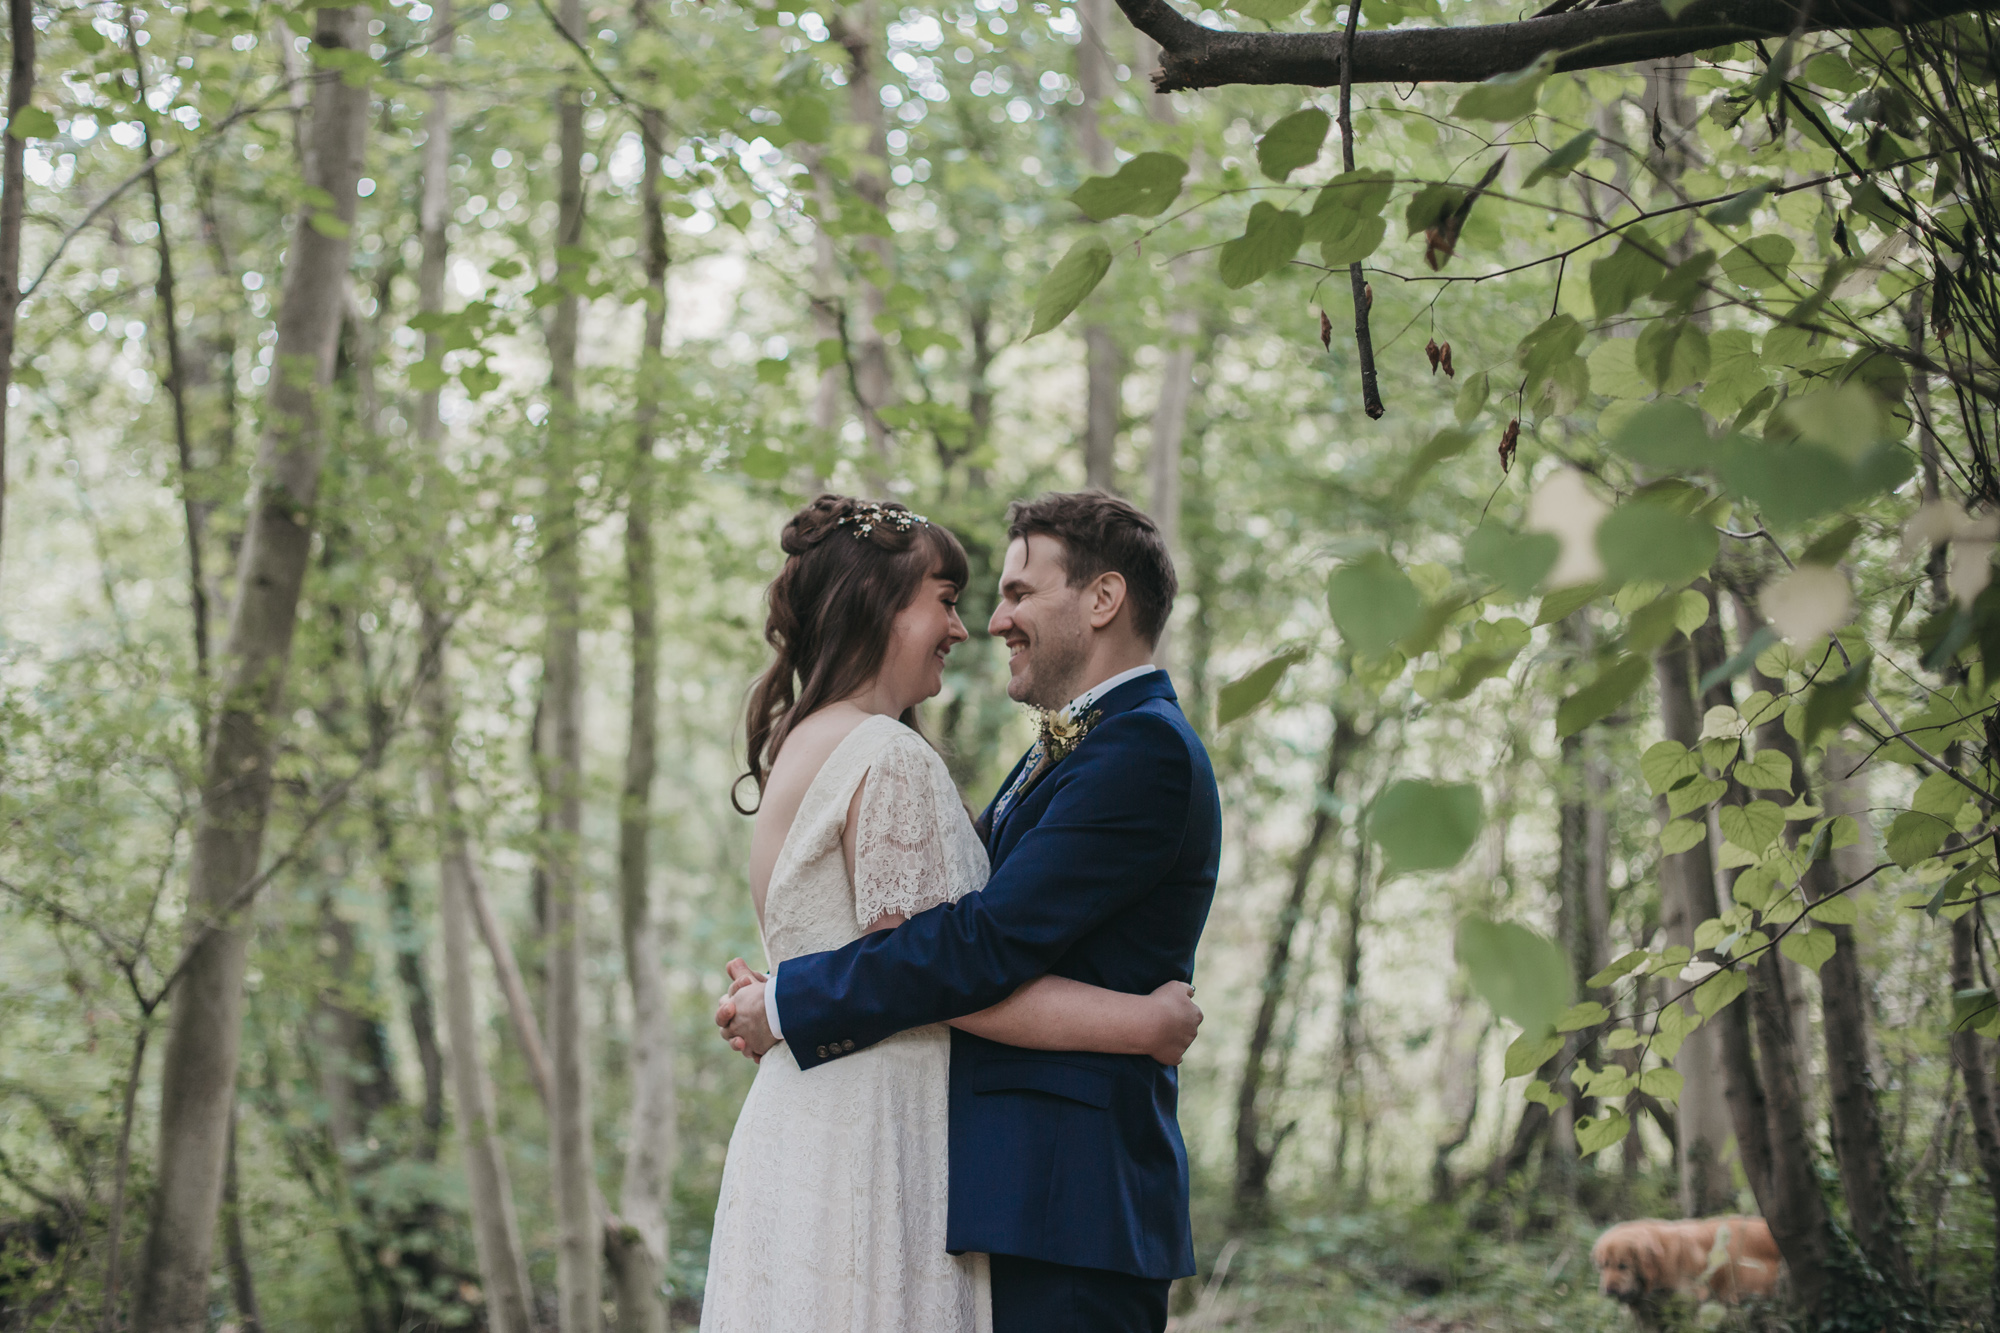 Kristy-Back-Garden-Outdoor-Wedding-Sheffield-Industrial-Warehouse-Wedding-Bohemian-Kate-Beaumont-Dahlia-Dress-27.jpg